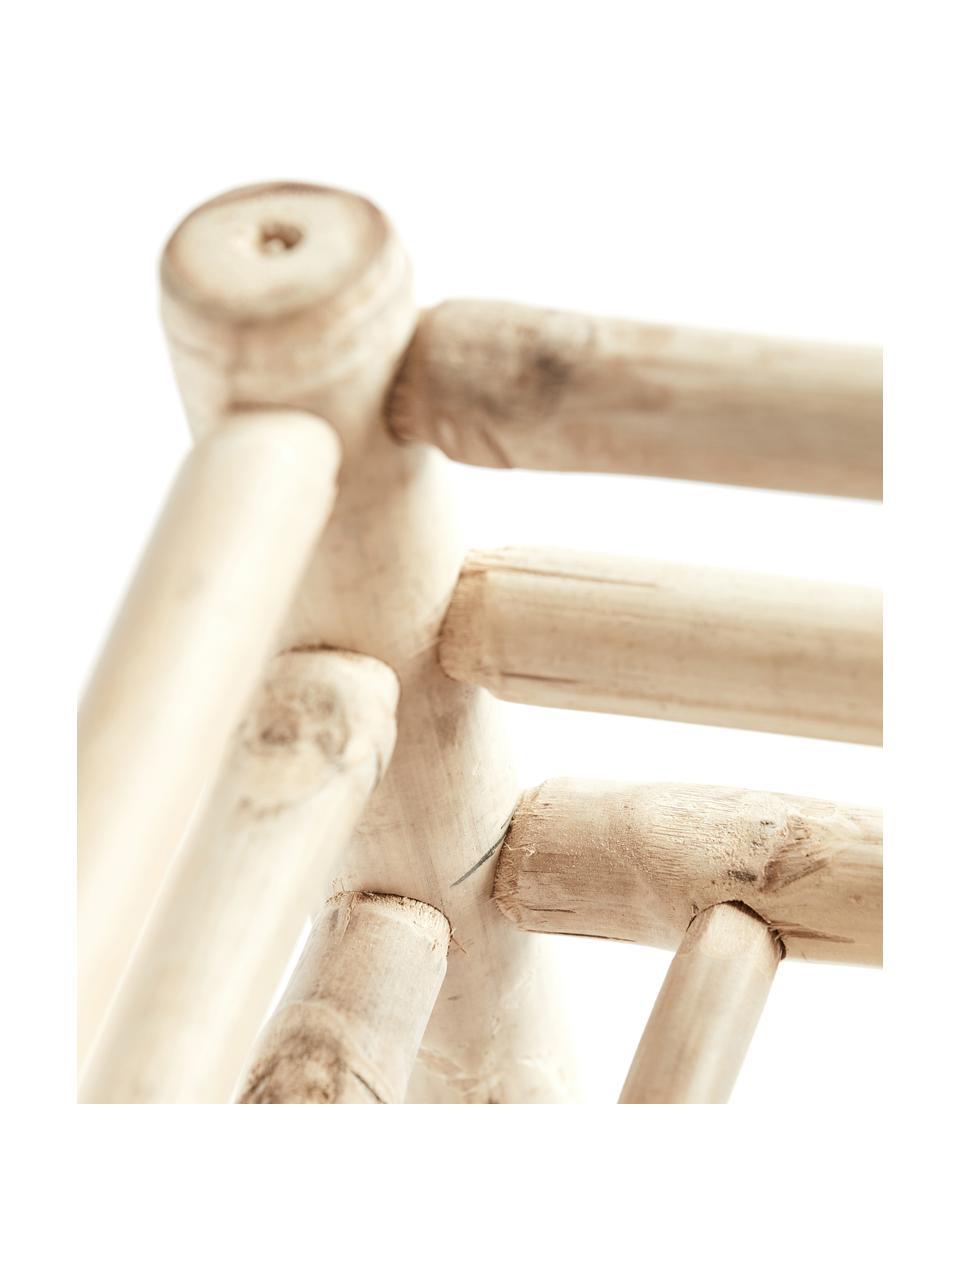 Credenza bassa in bambù Bamra, Bambù, Marrone chiaro, Larg. 150 x Alt. 55 cm